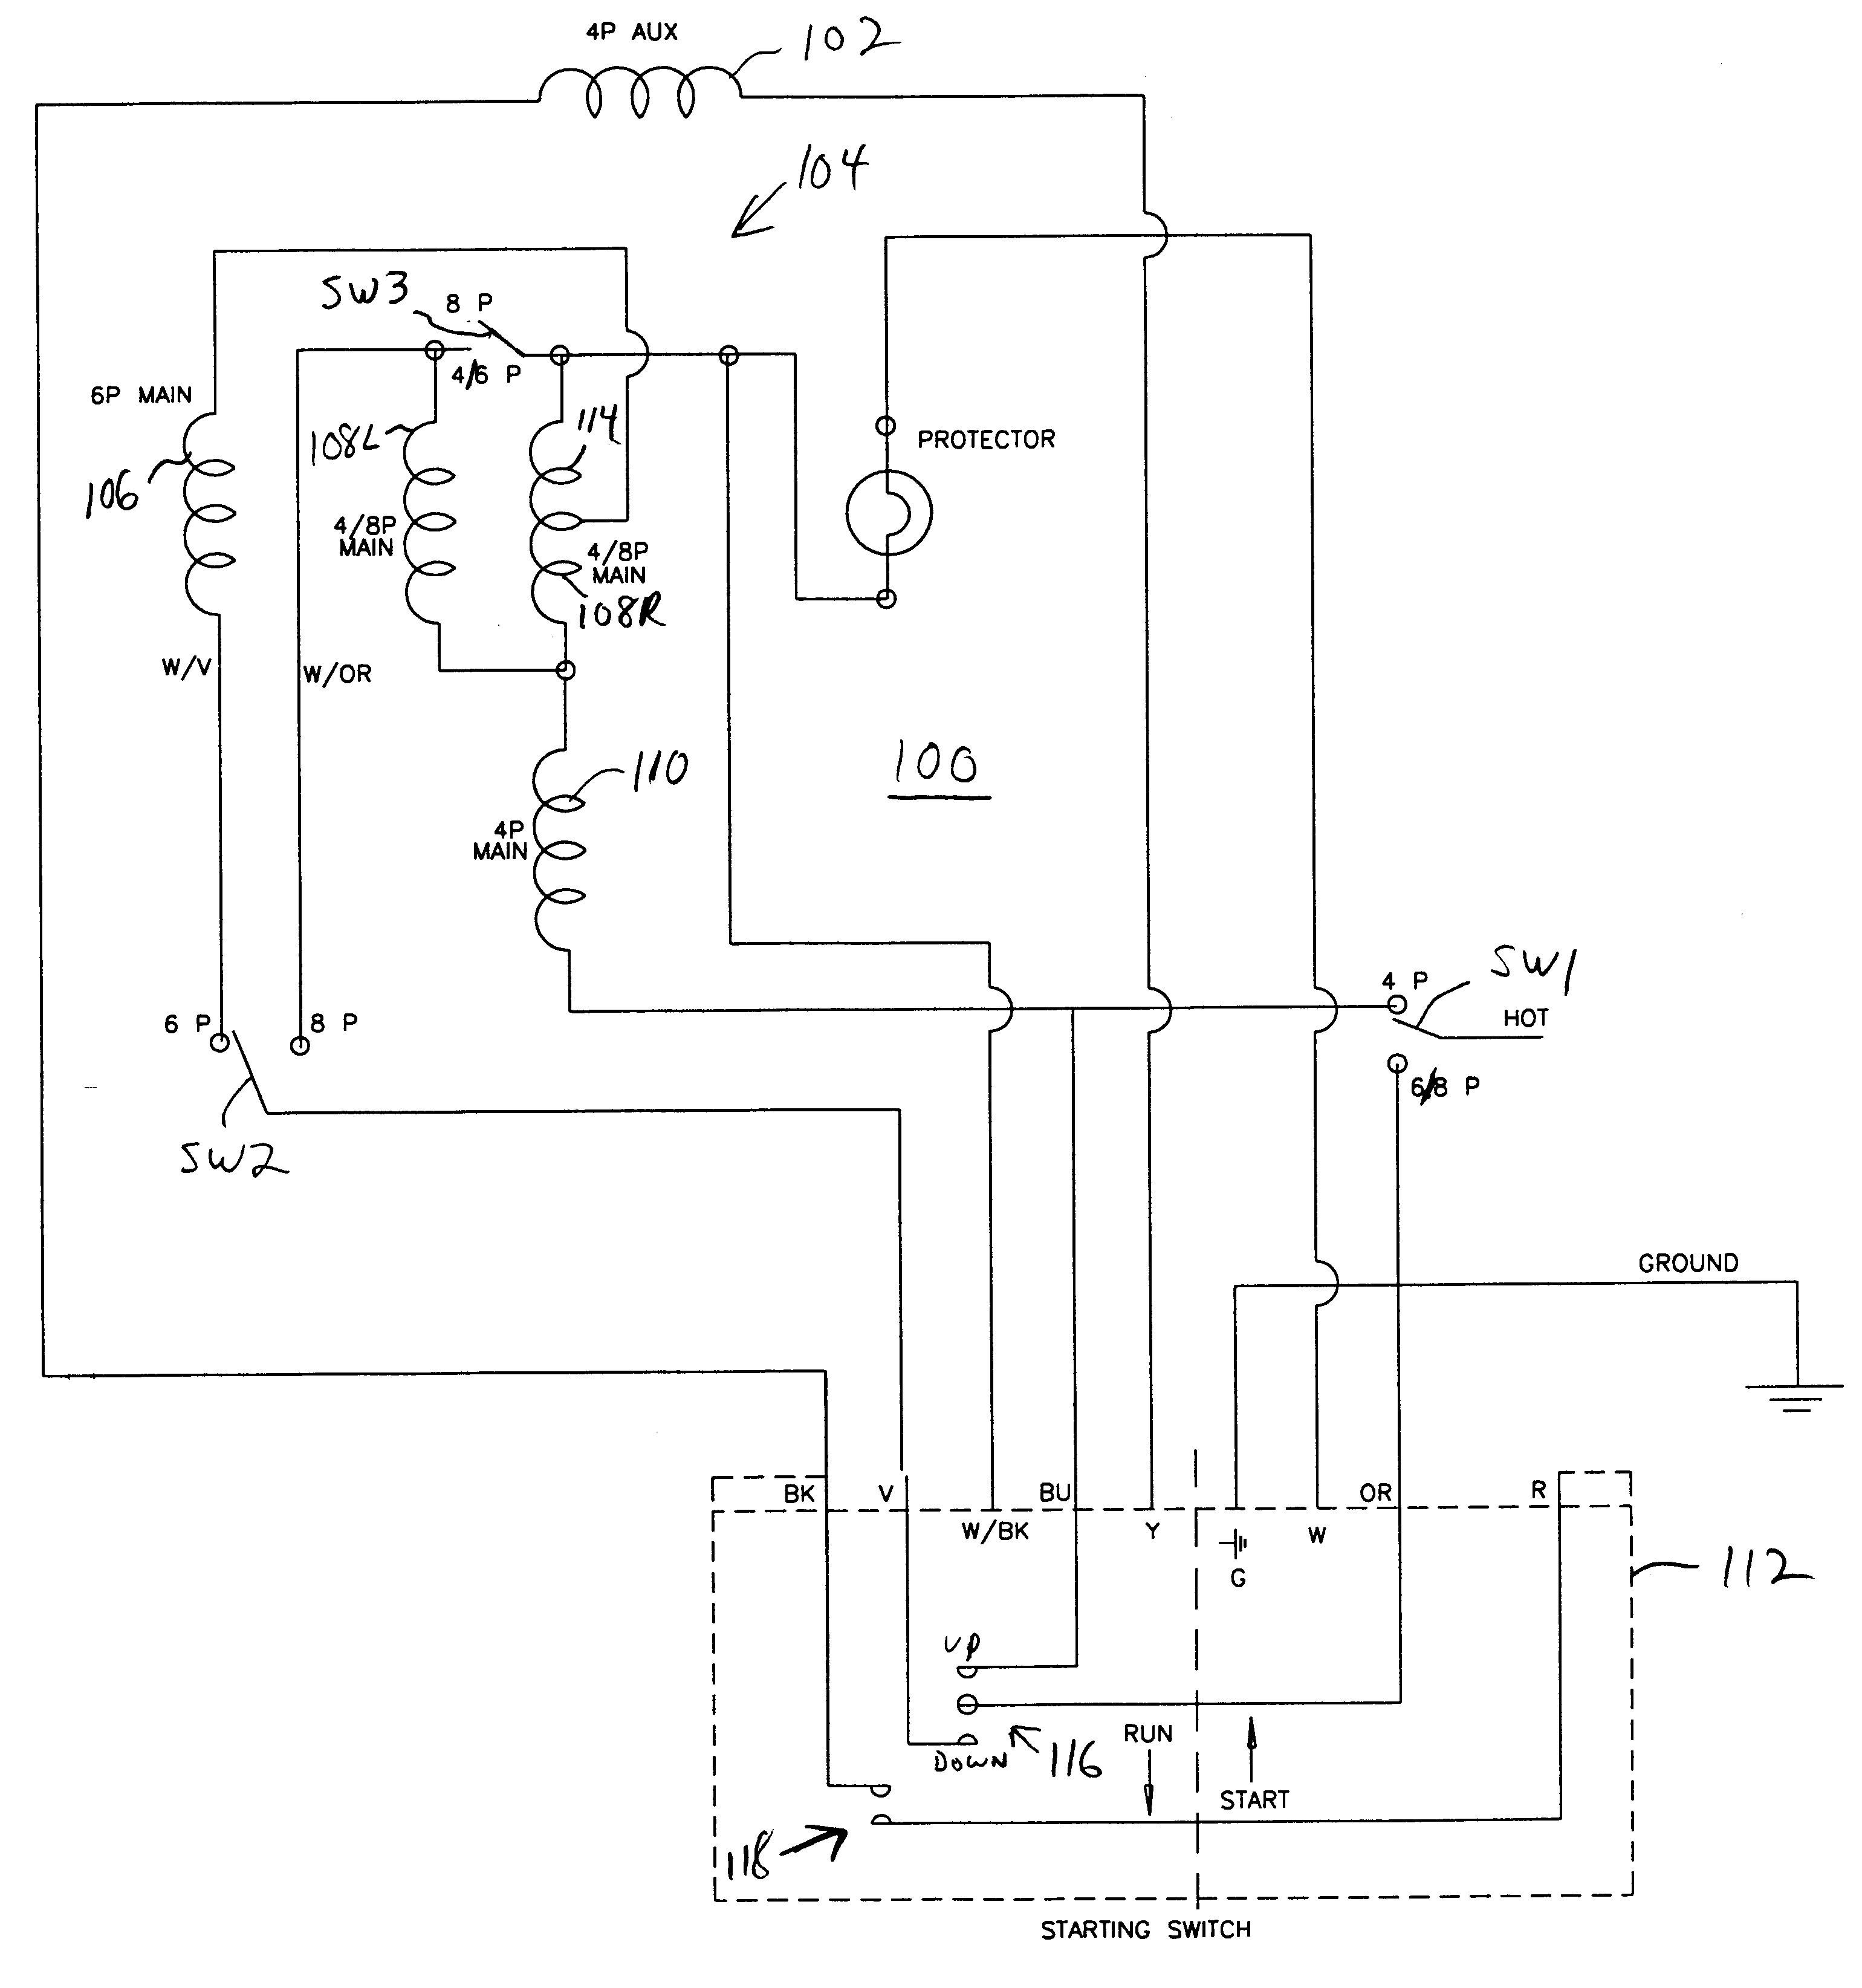 Wiring Diagram For Single Phase Reversing Motor Refrence Capacitor